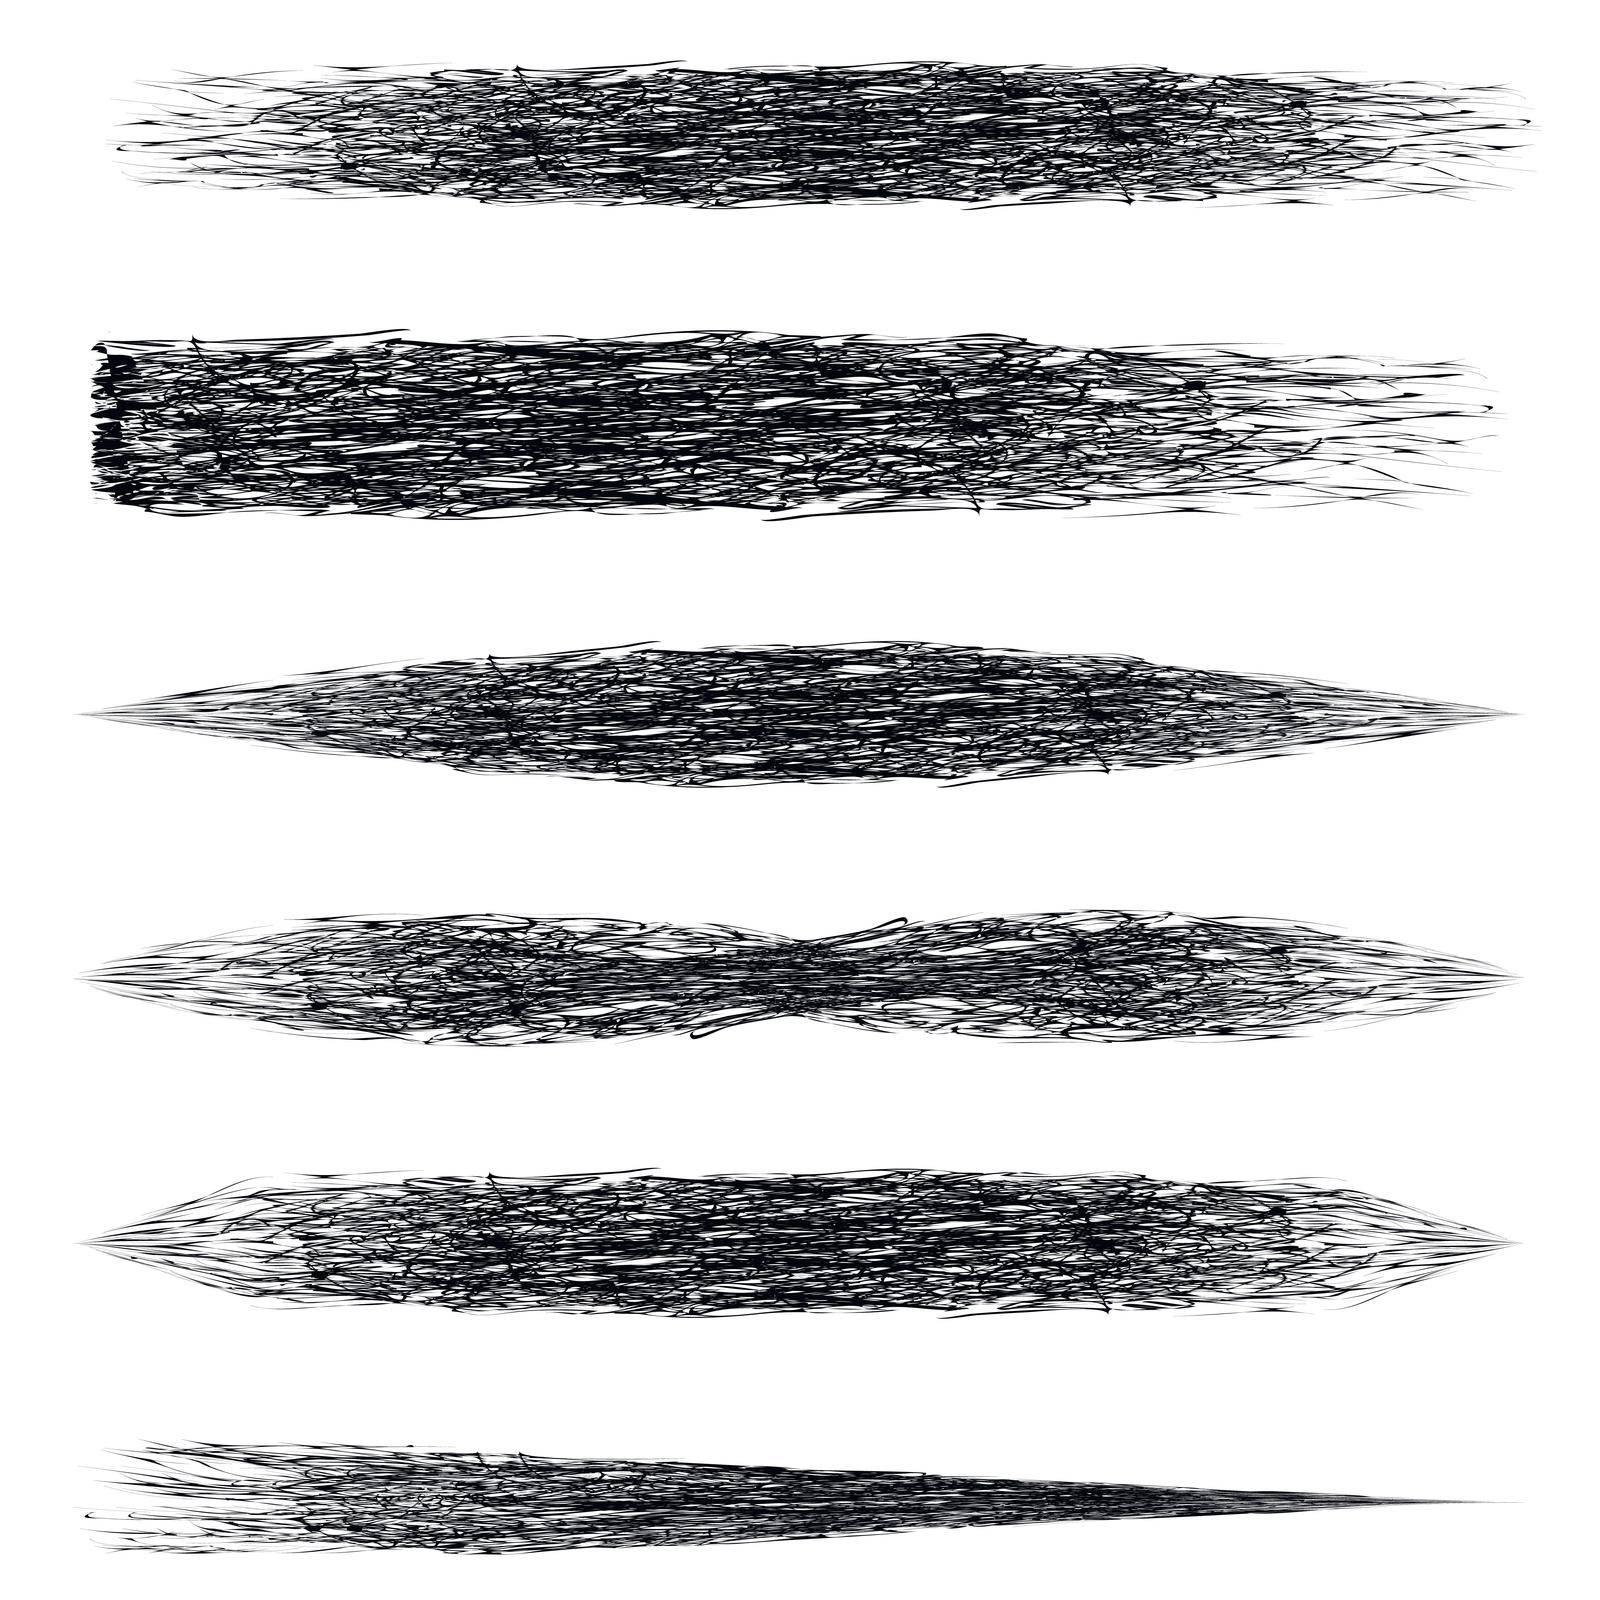 Set brush mascara, vector makeup brush strokes with a mascara brush strokes template for makeup